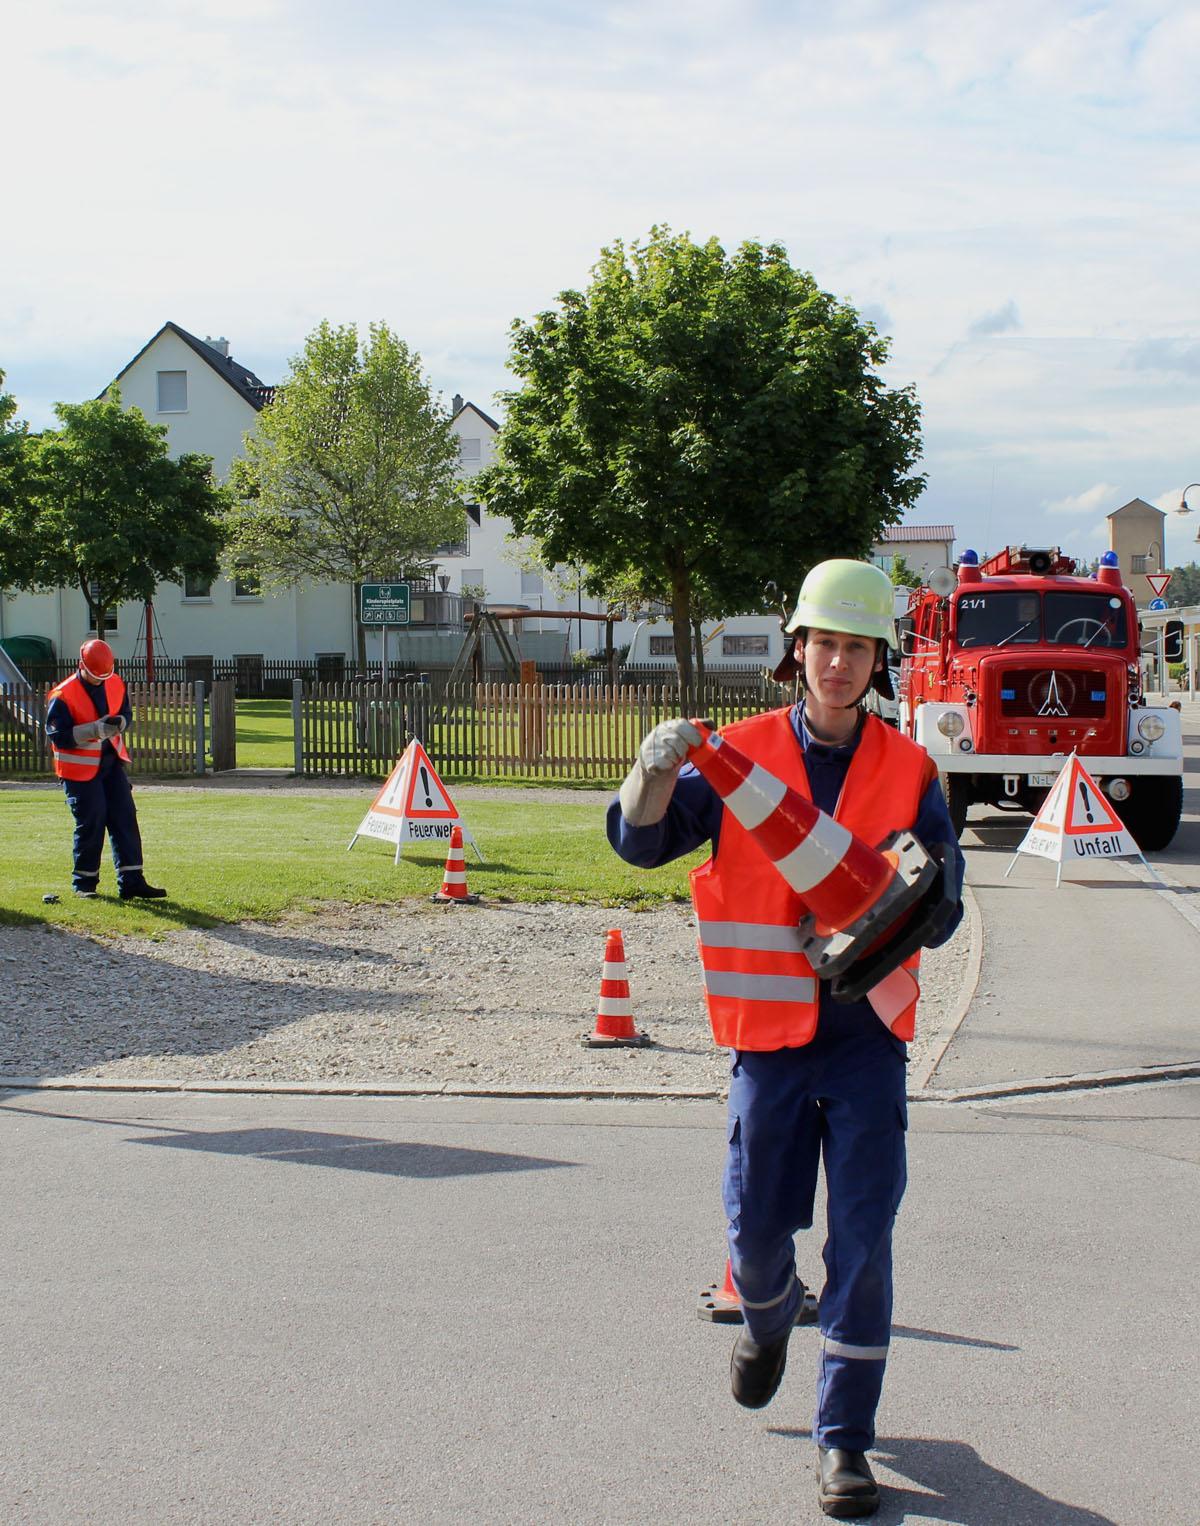 2014_05_17-Jugendflamme-B13-1200p